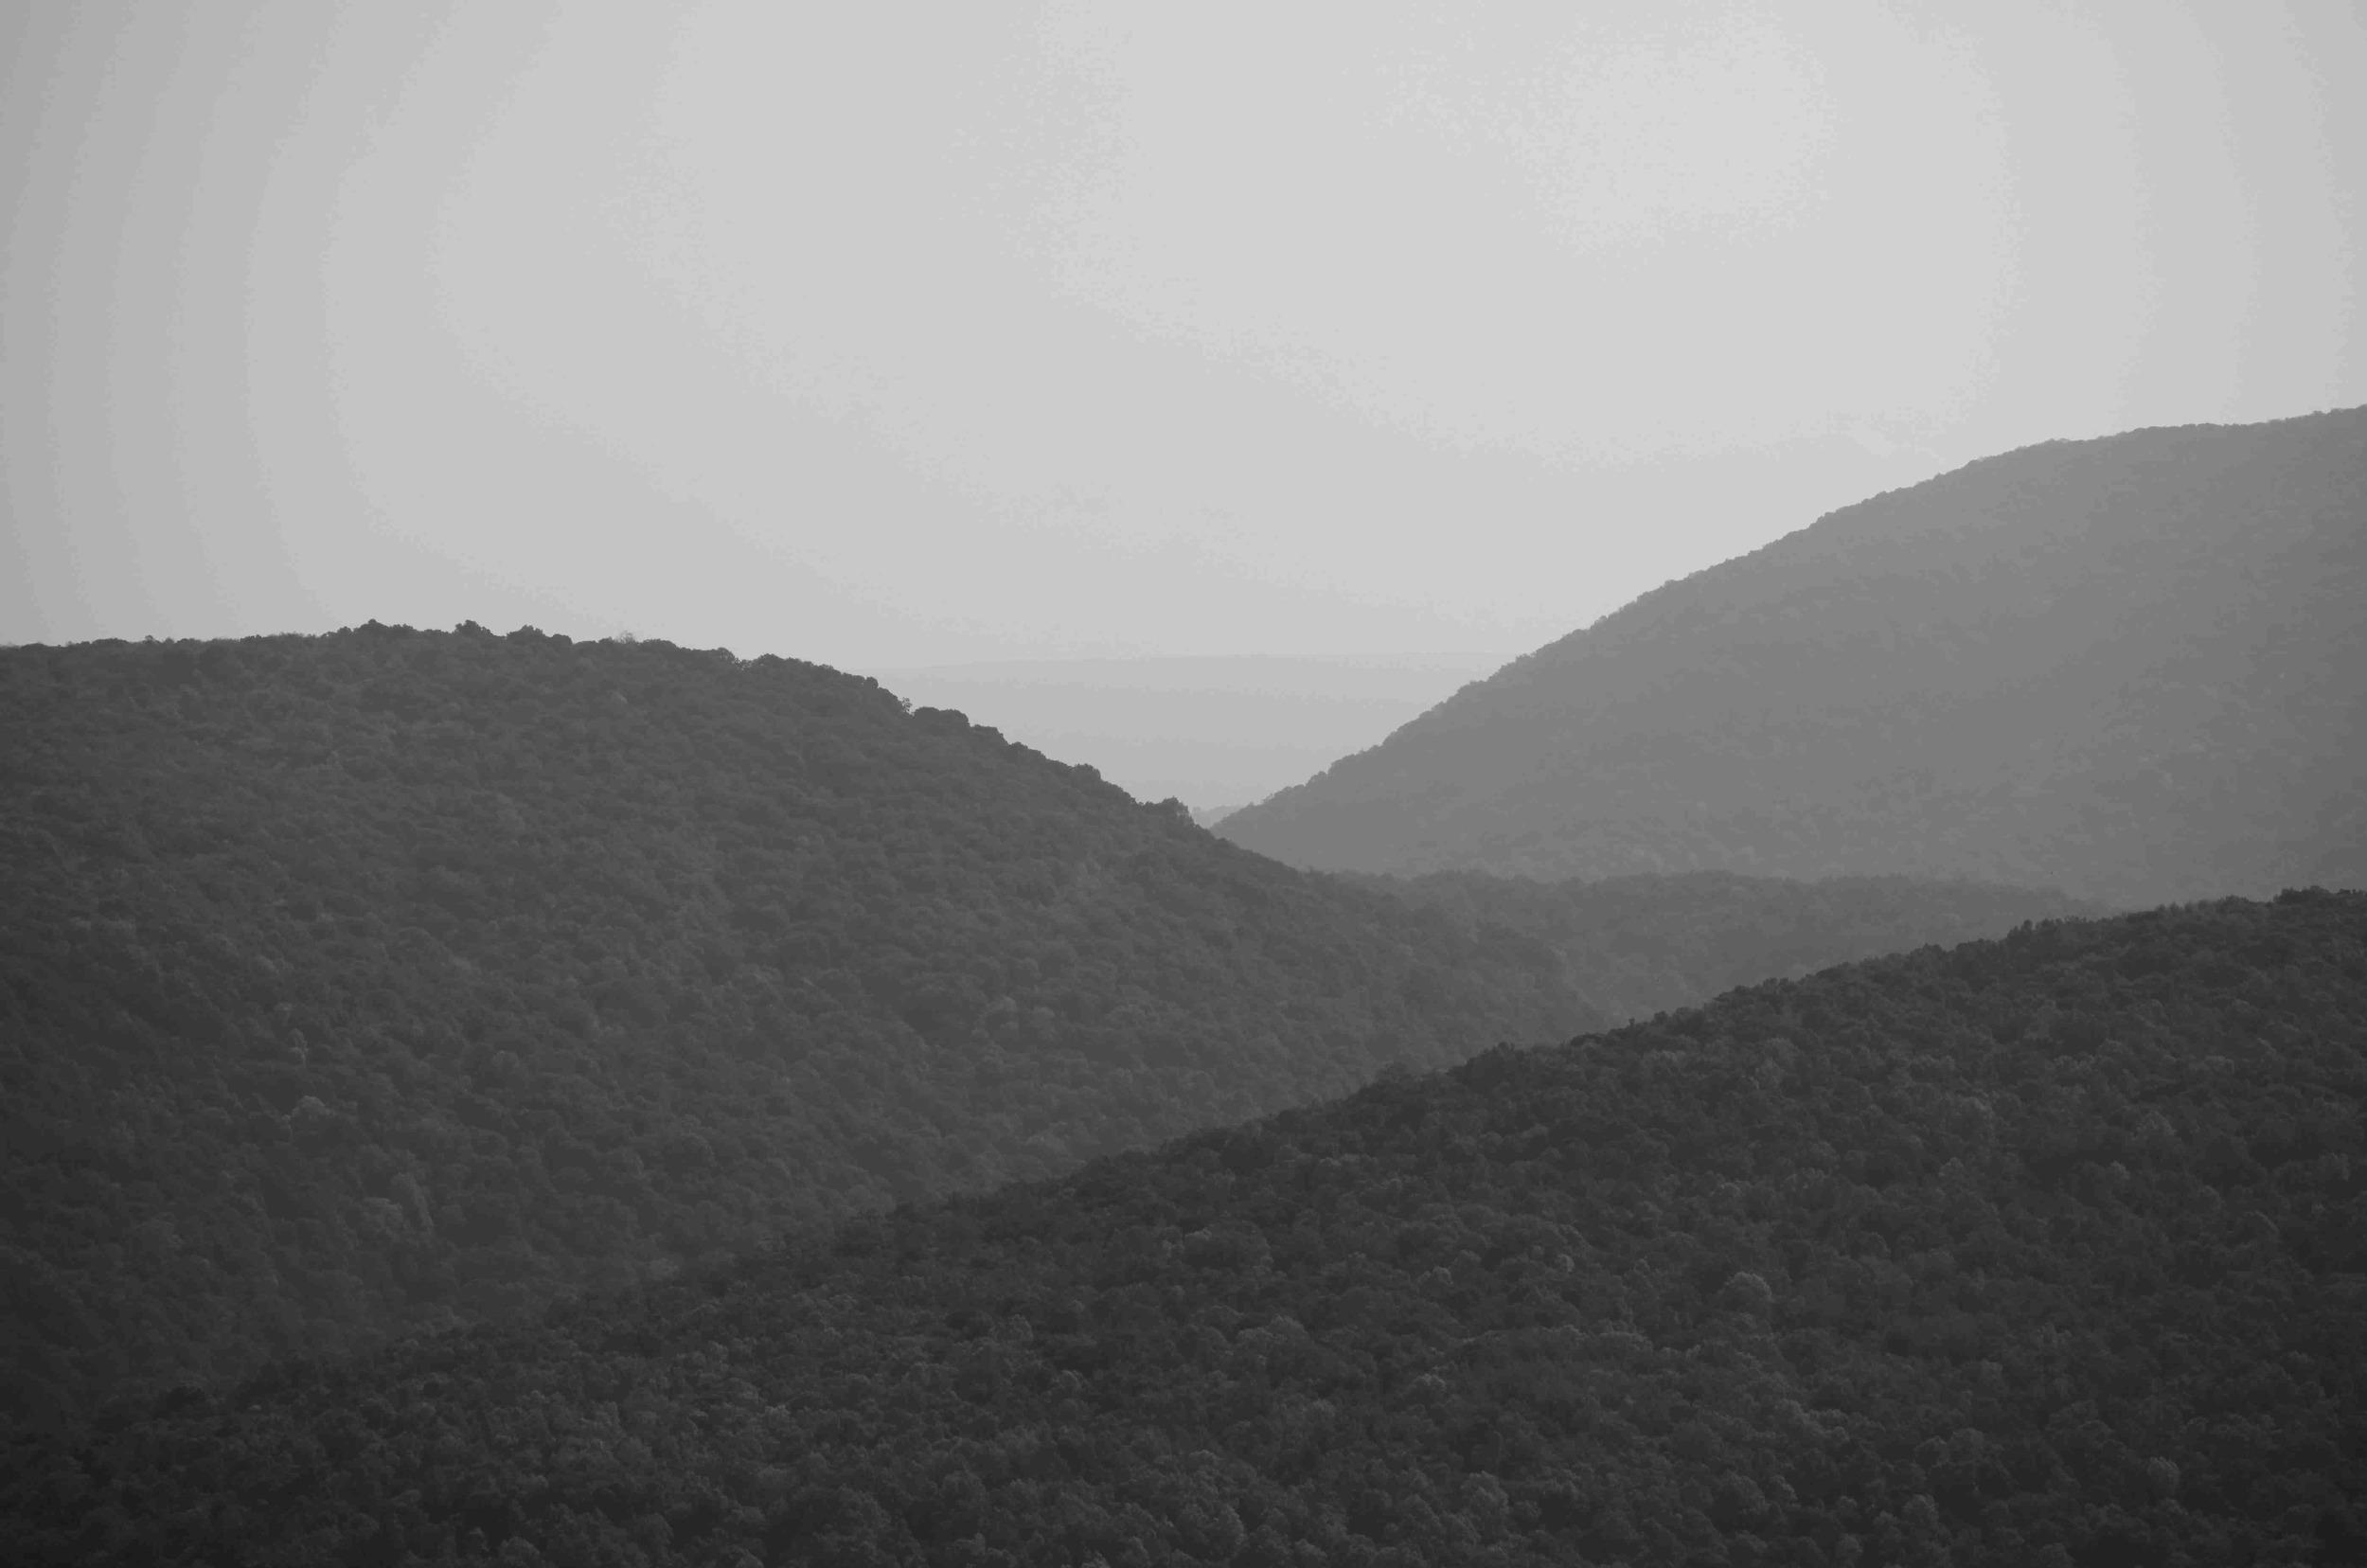 Three Mountains IMG_8337 No Border Compressed.jpg